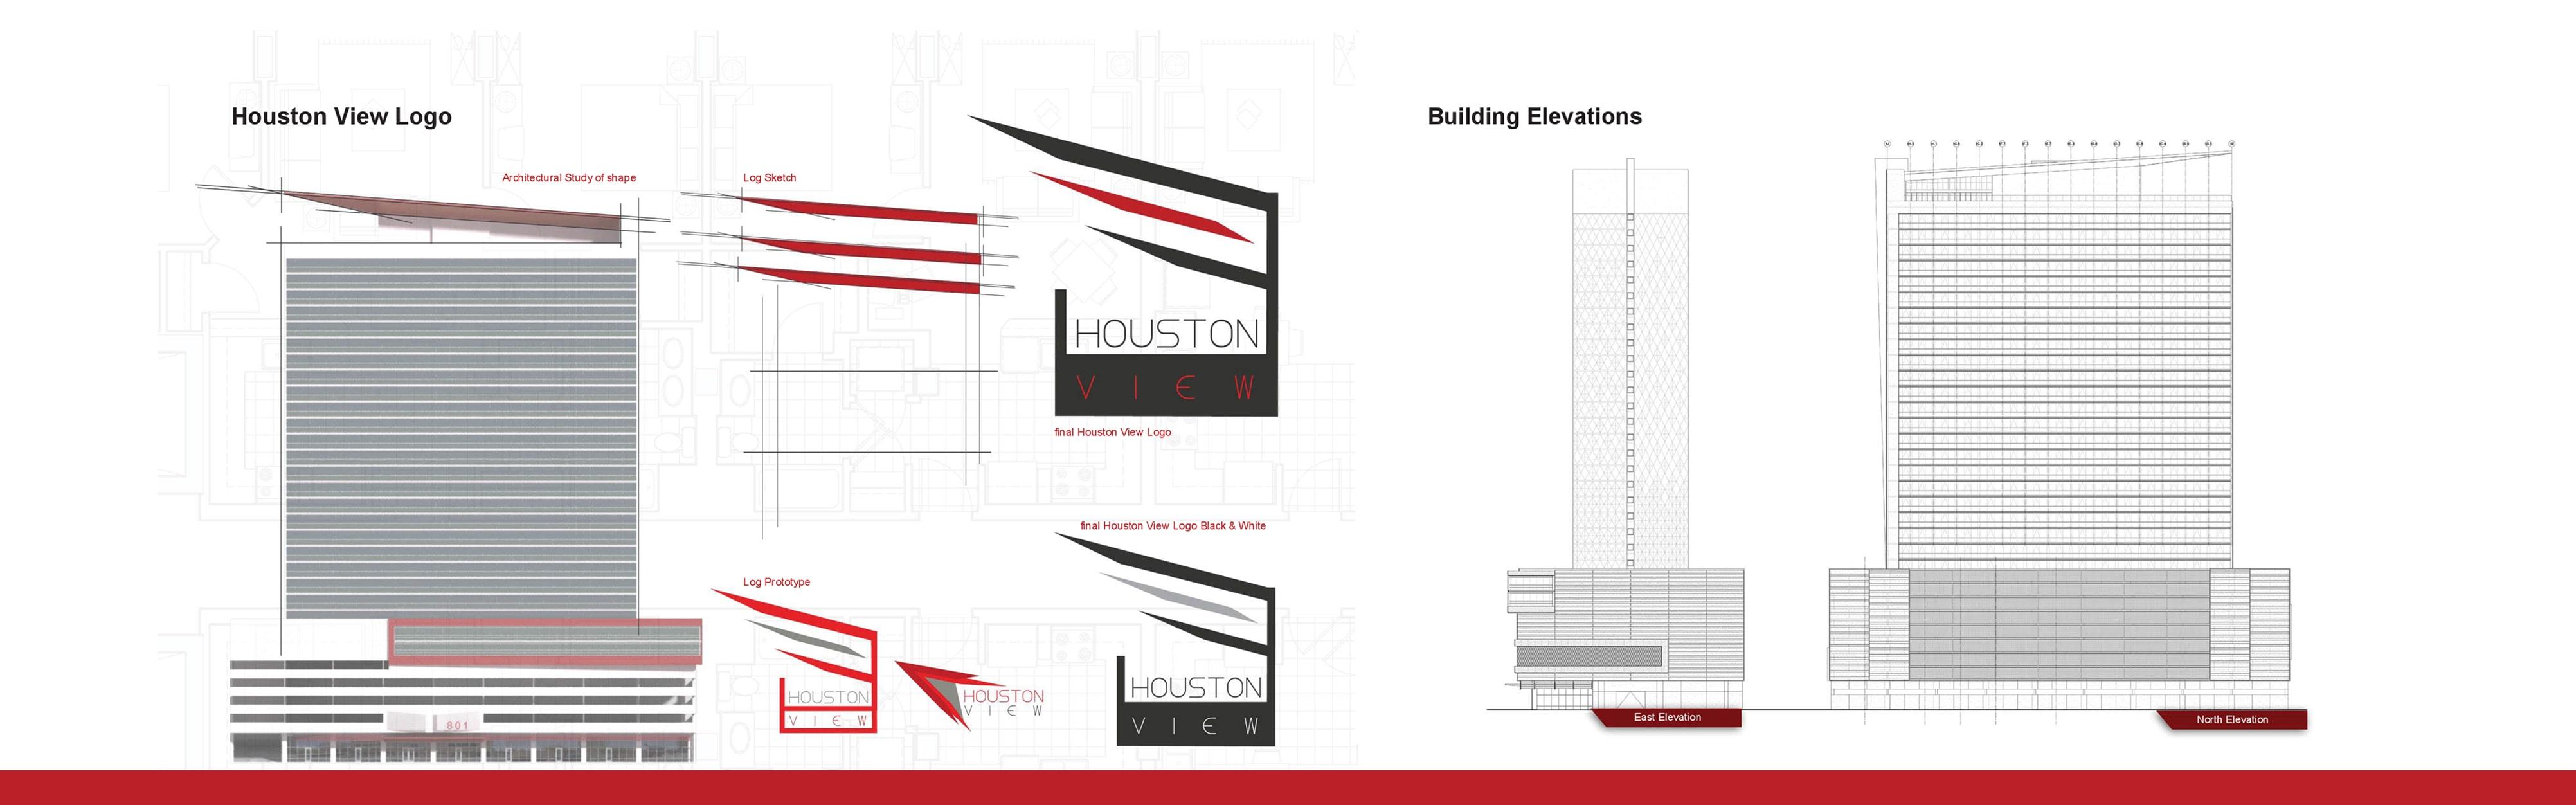 Master Planning Architecture Design In Erie Colorado